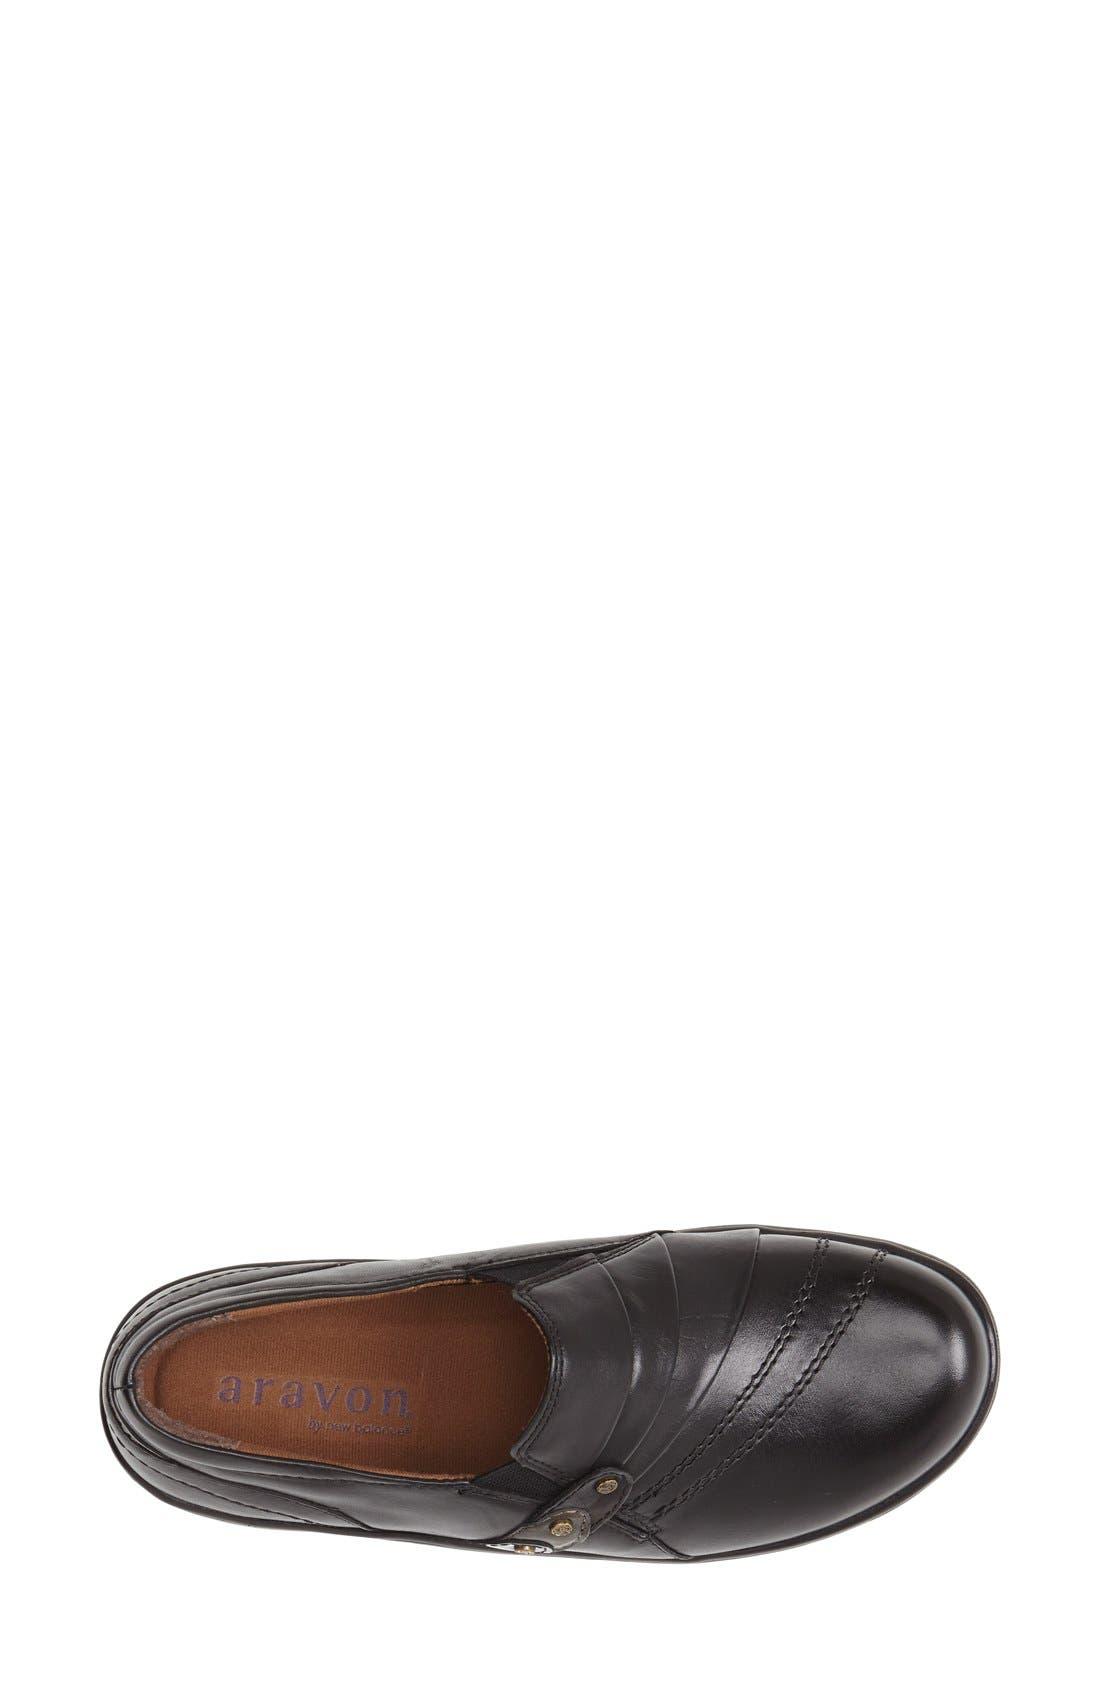 Alternate Image 3  - Aravon 'Danielle' Loafer Flat (Women)